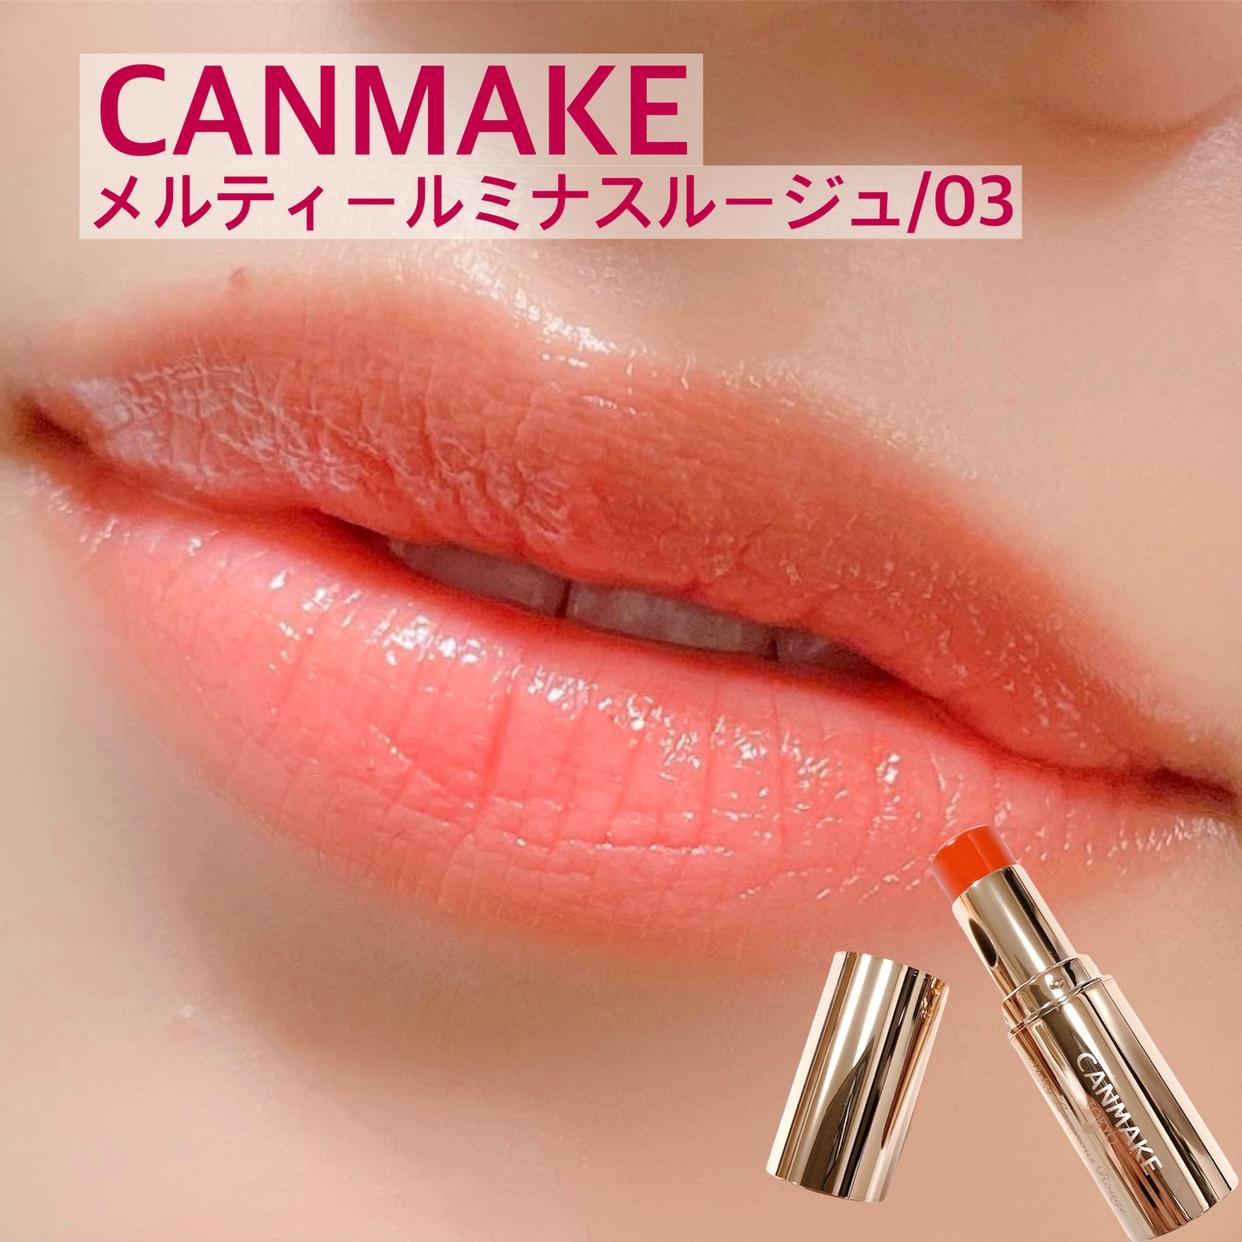 CANMAKE(キャンメイク) メルティールミナスルージュの良い点・メリットに関するMiiさんの口コミ画像2